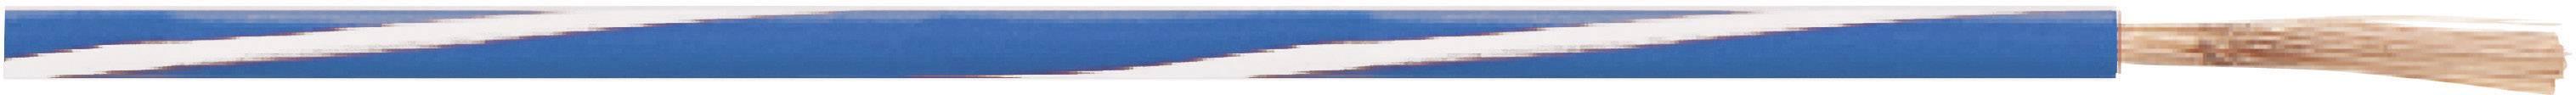 Opletenie / lanko LappKabel 4512443S X05V-K, 1 x 1 mm², vonkajší Ø 2.60 mm, metrový tovar, biela, modrá